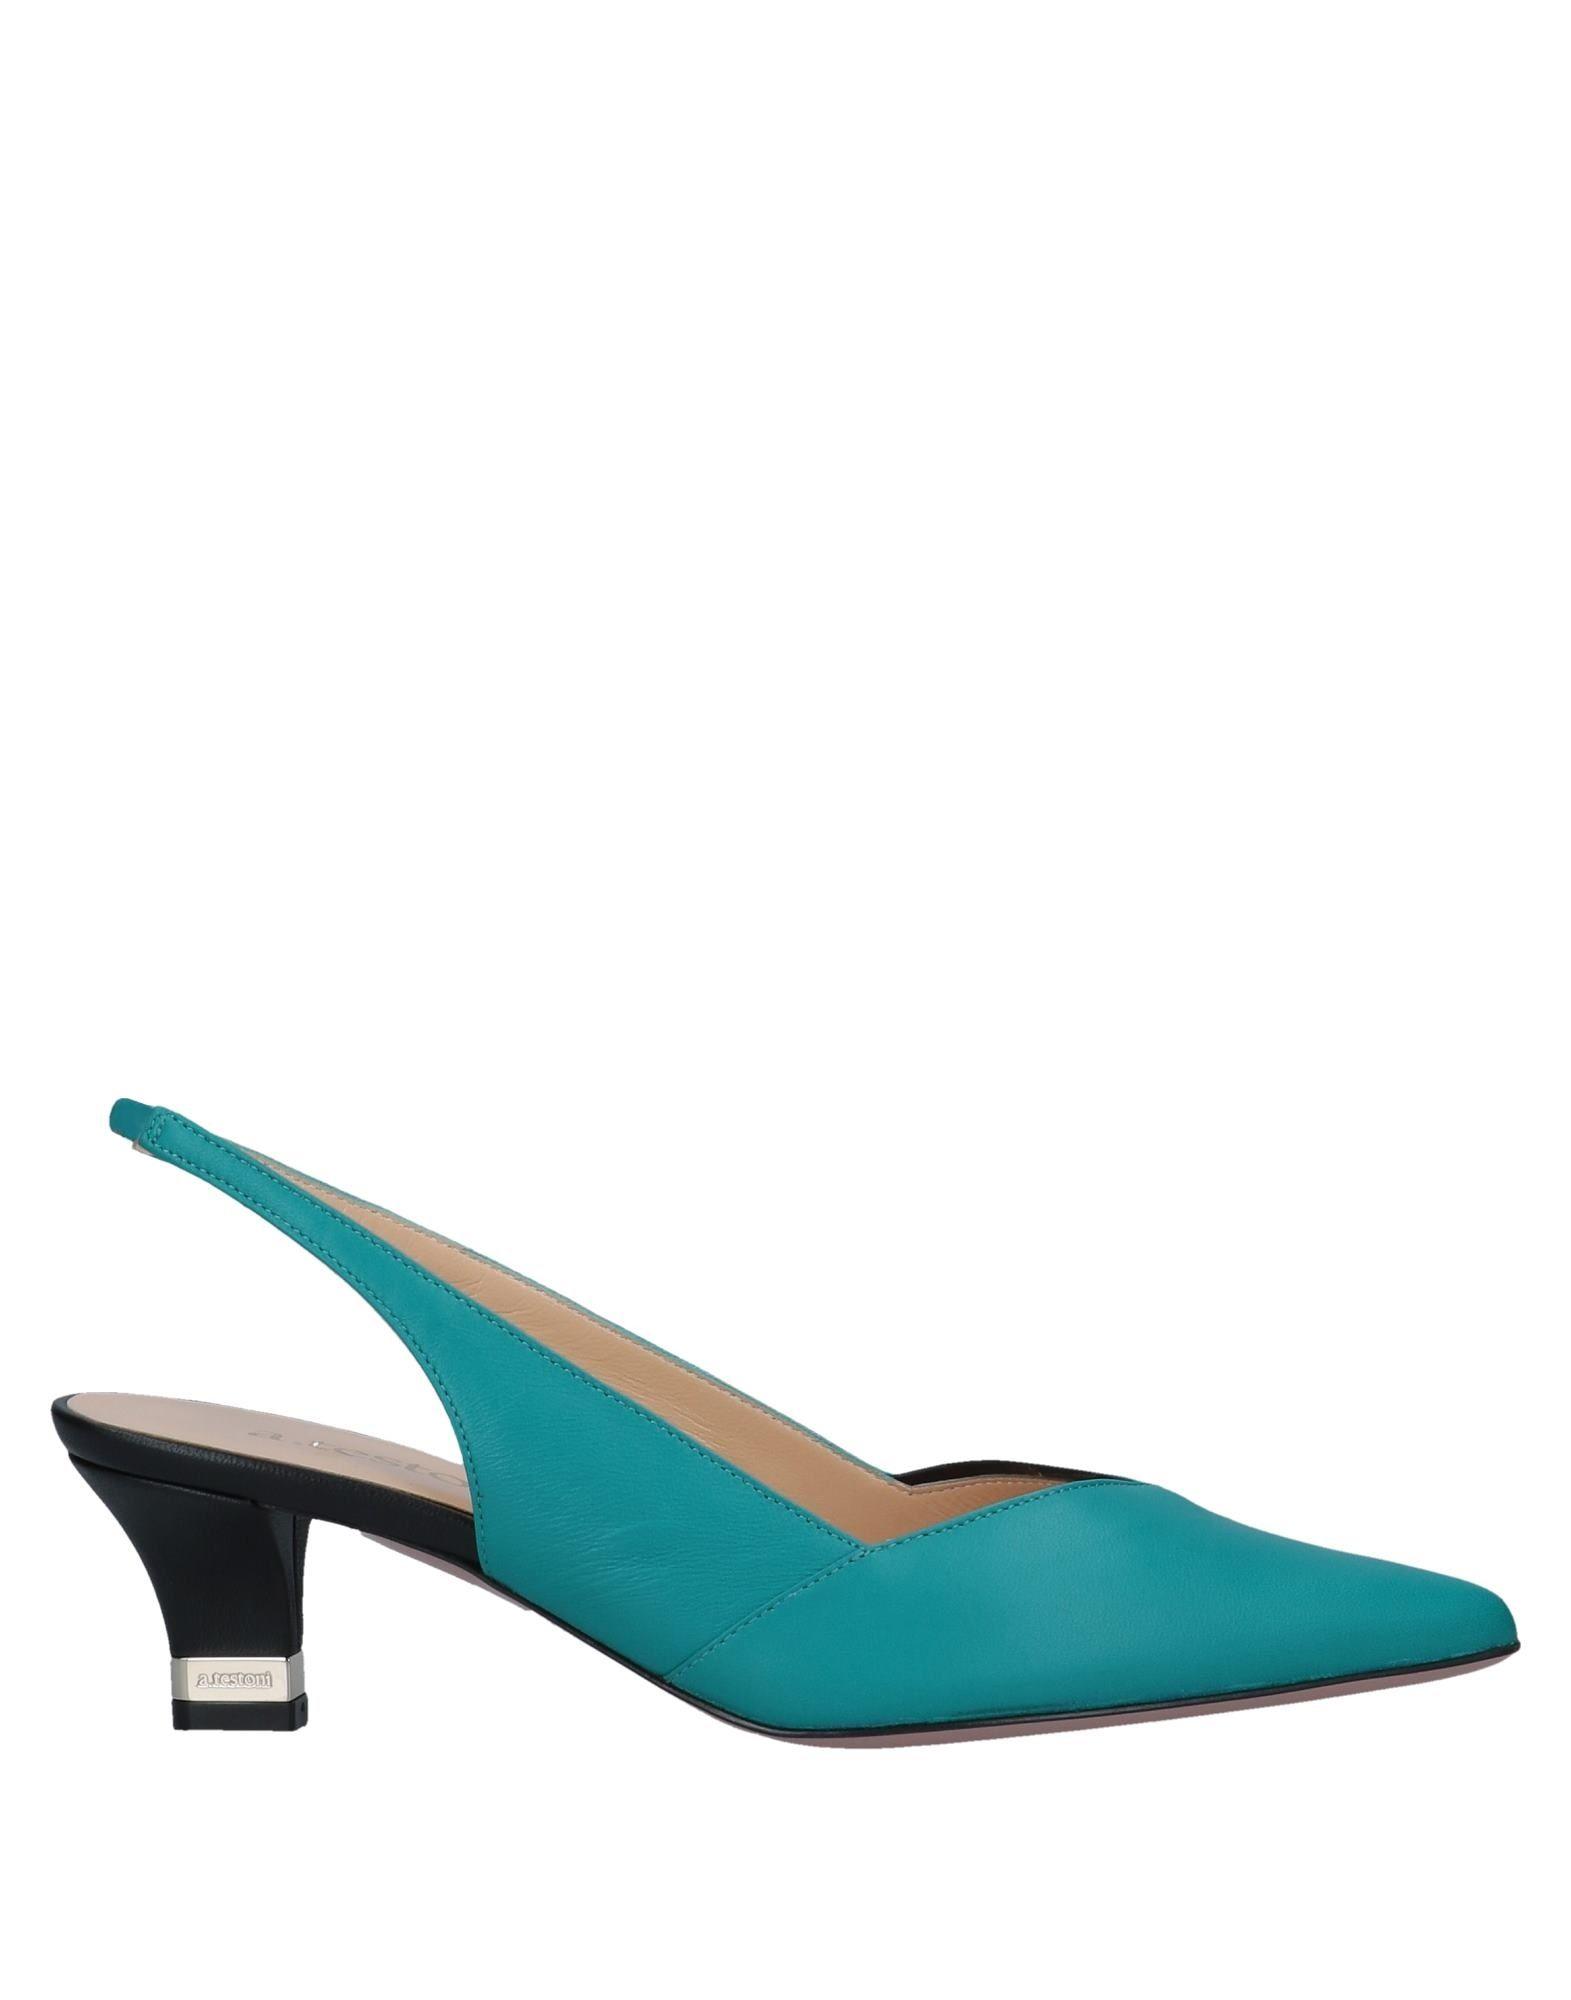 Stilvolle billige Schuhe A.Testoni Pumps Damen  11546556GX